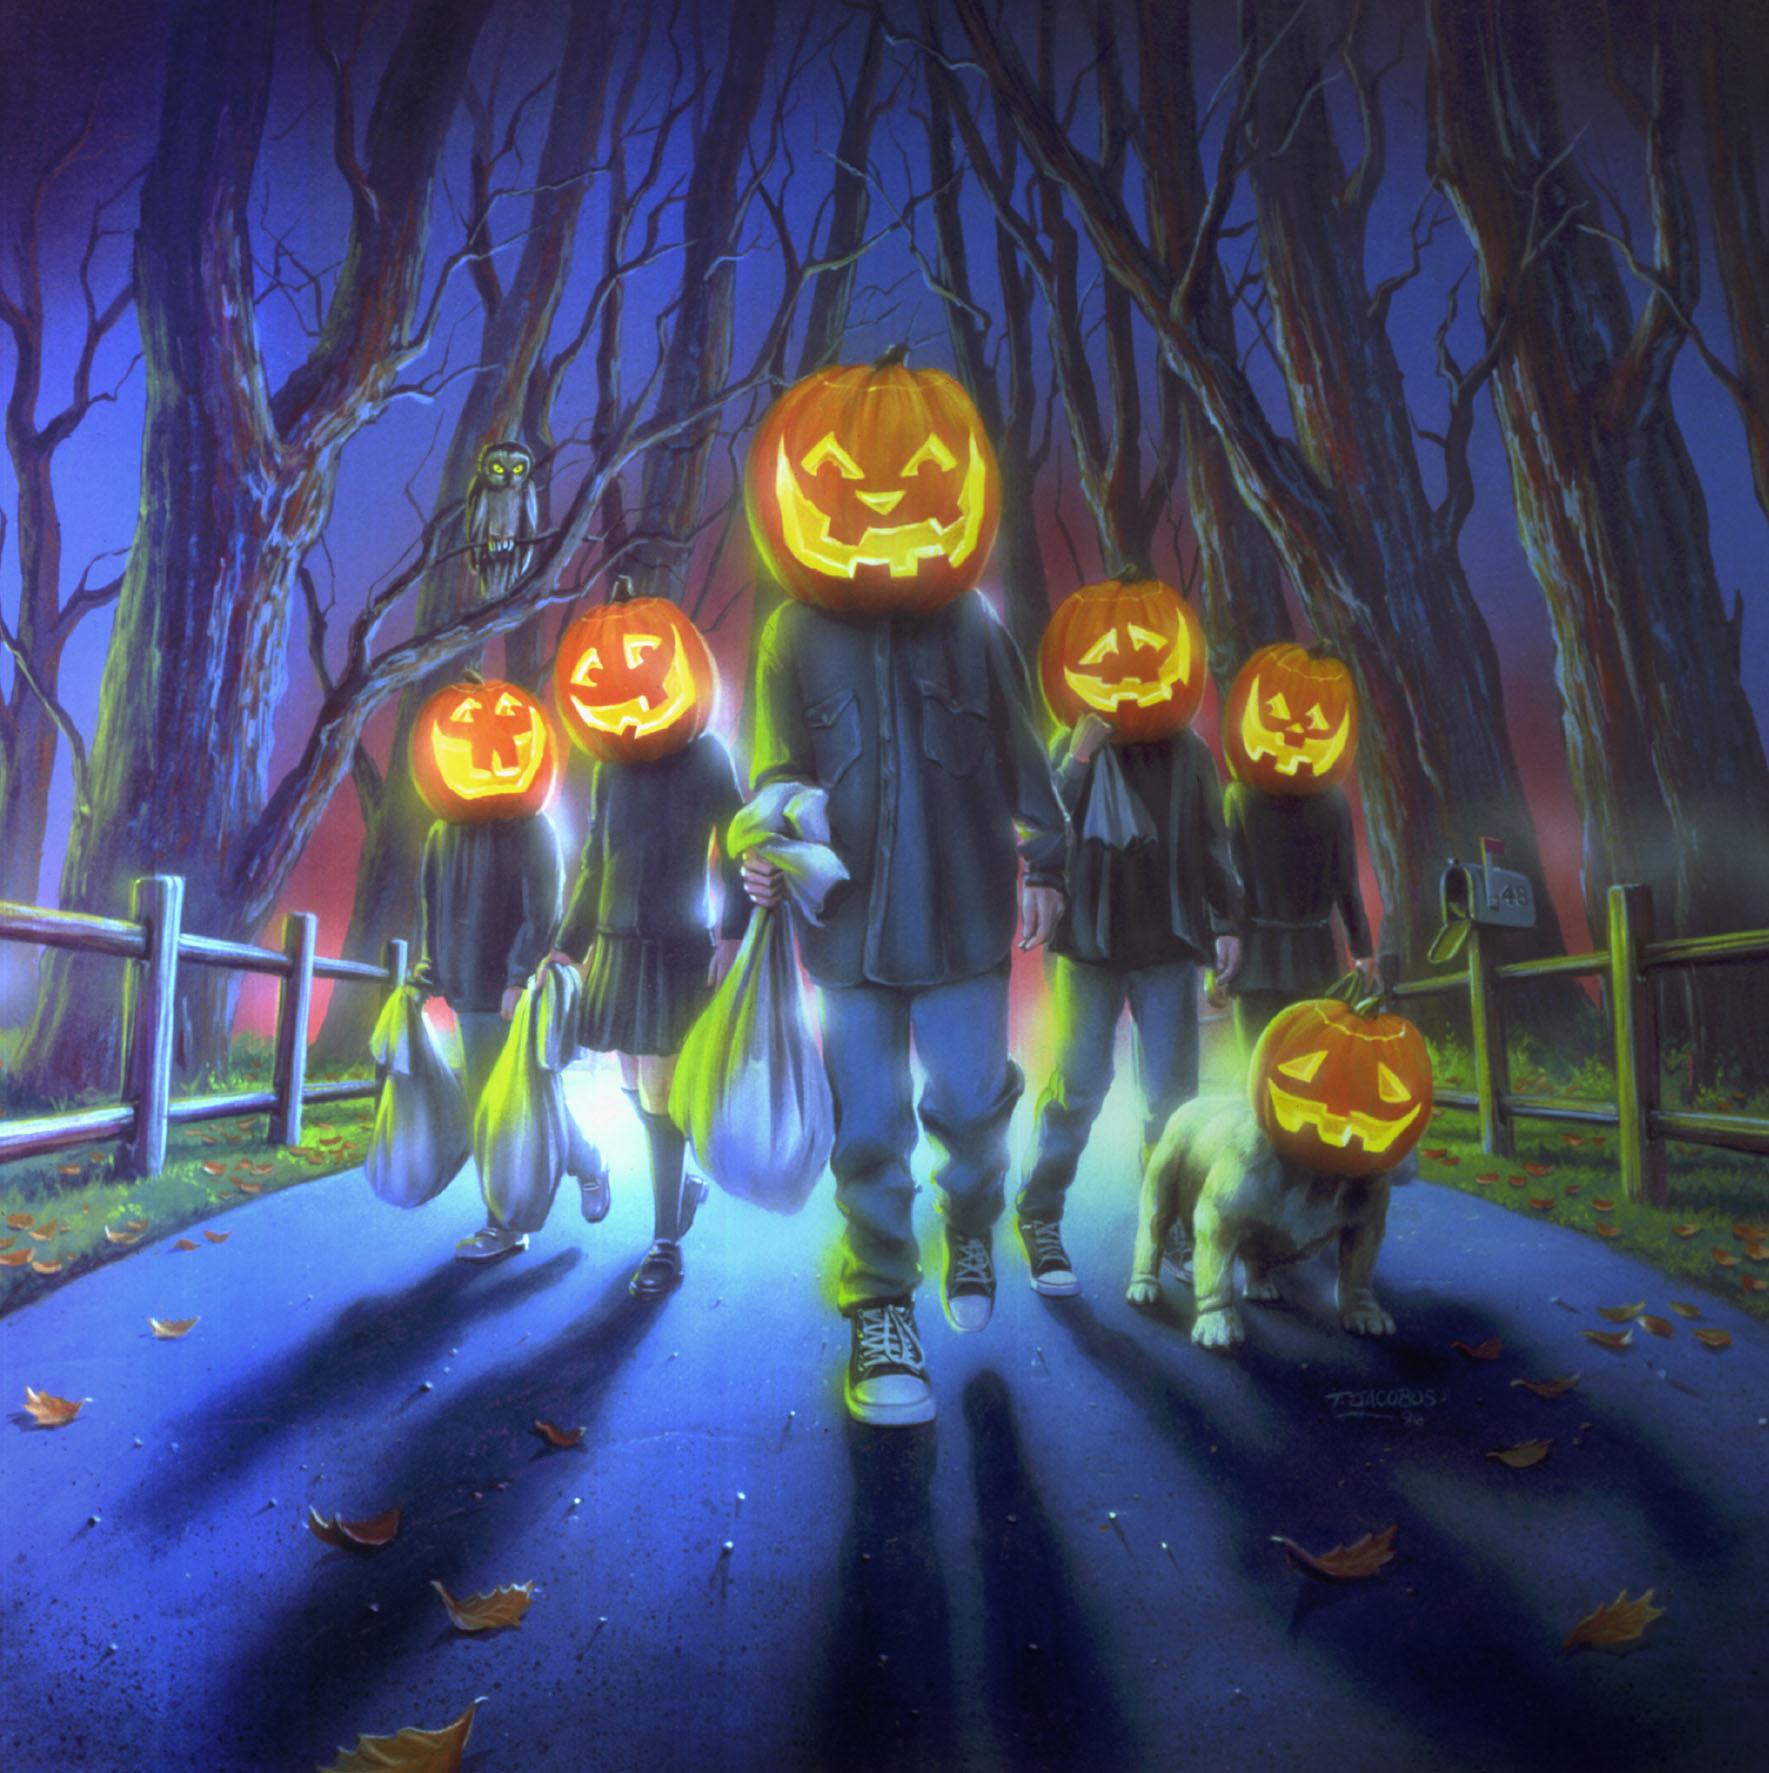 goosebumps 2 pumpkin head  The Pumpkin Heads | Goosebumps Wiki | Fandom